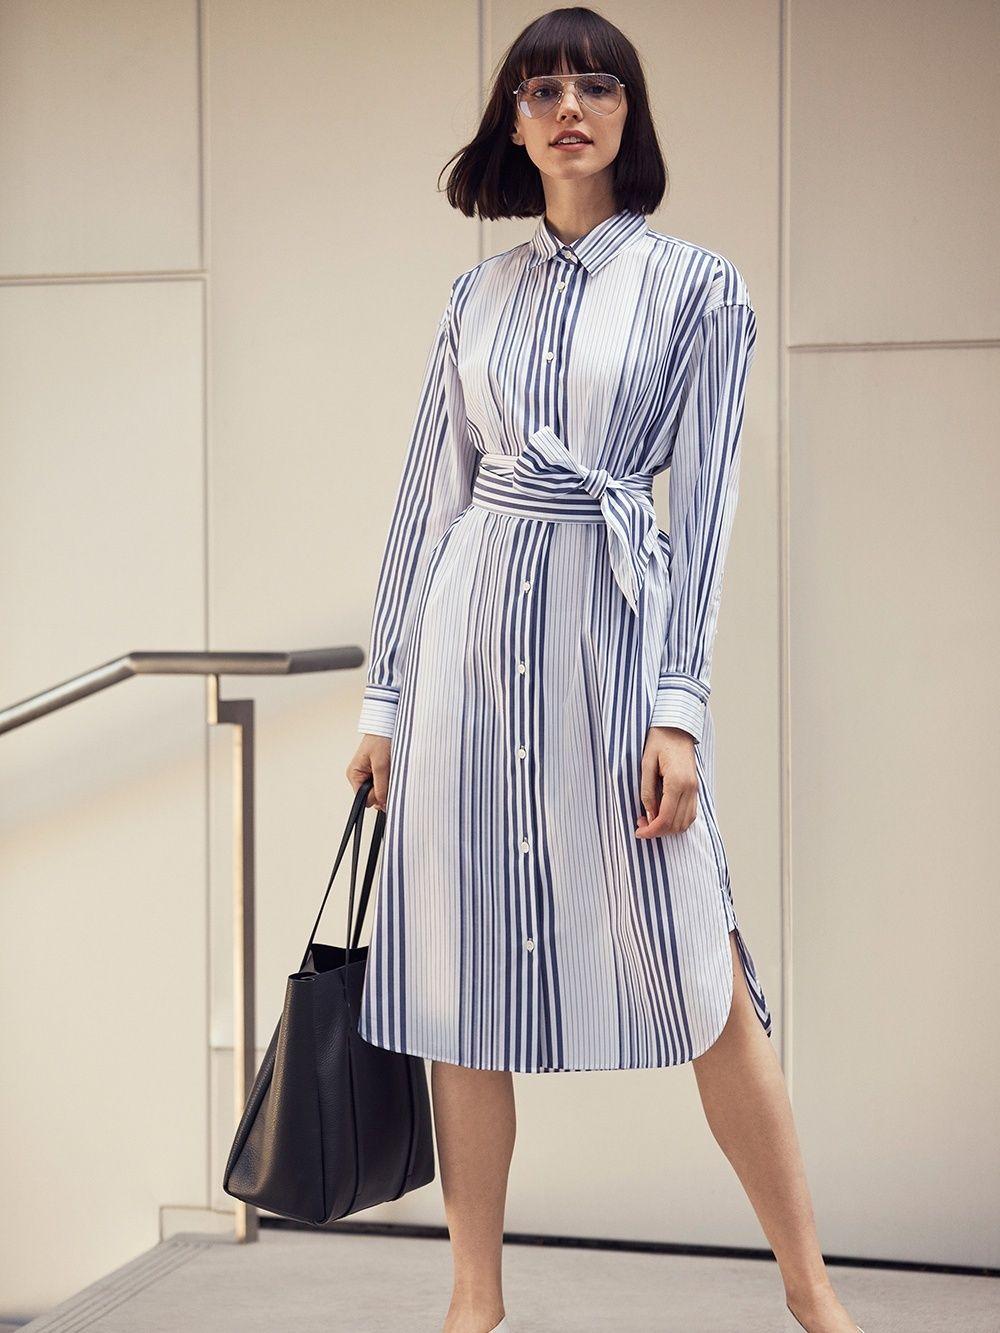 Coton Femme Longues Manches Chemise Robe ✖ Uniqlo Rayée ✖️i ZqnXfZE